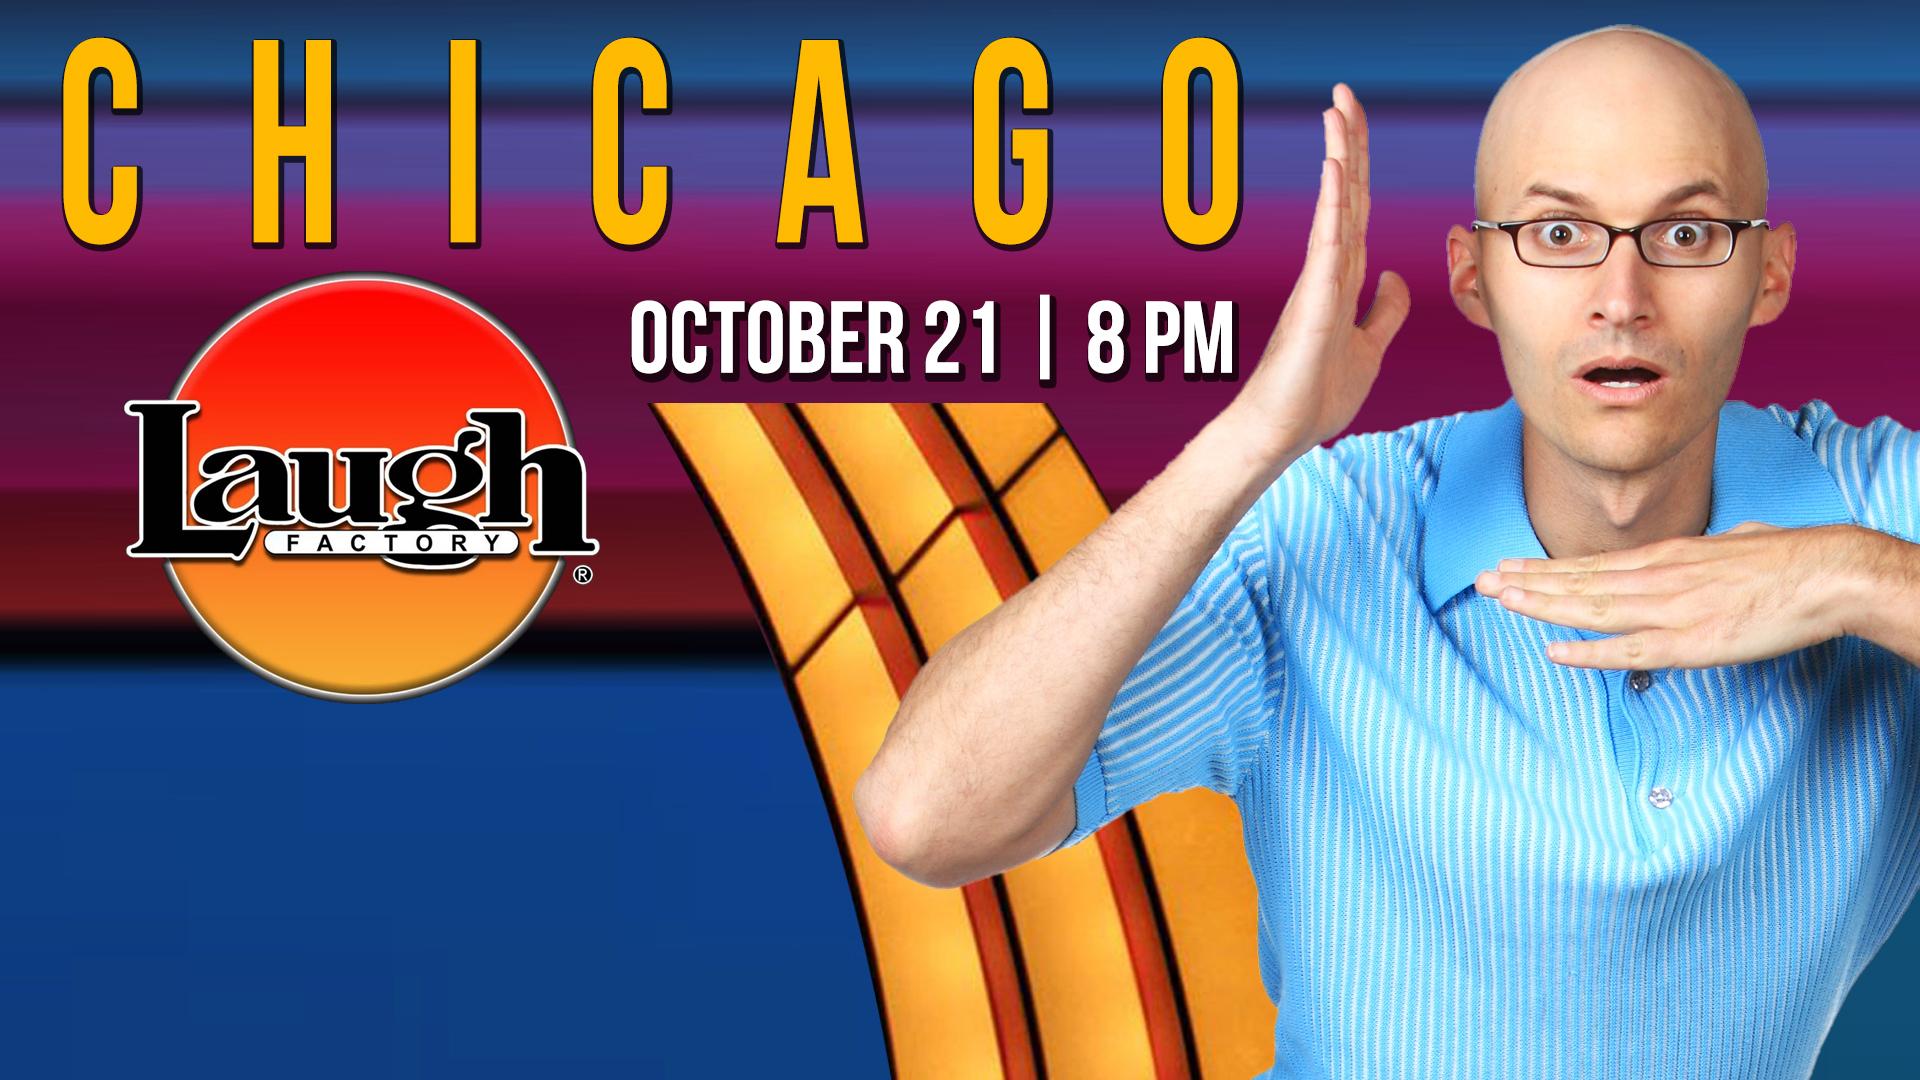 Chicago-Laugh-Factory-10-21